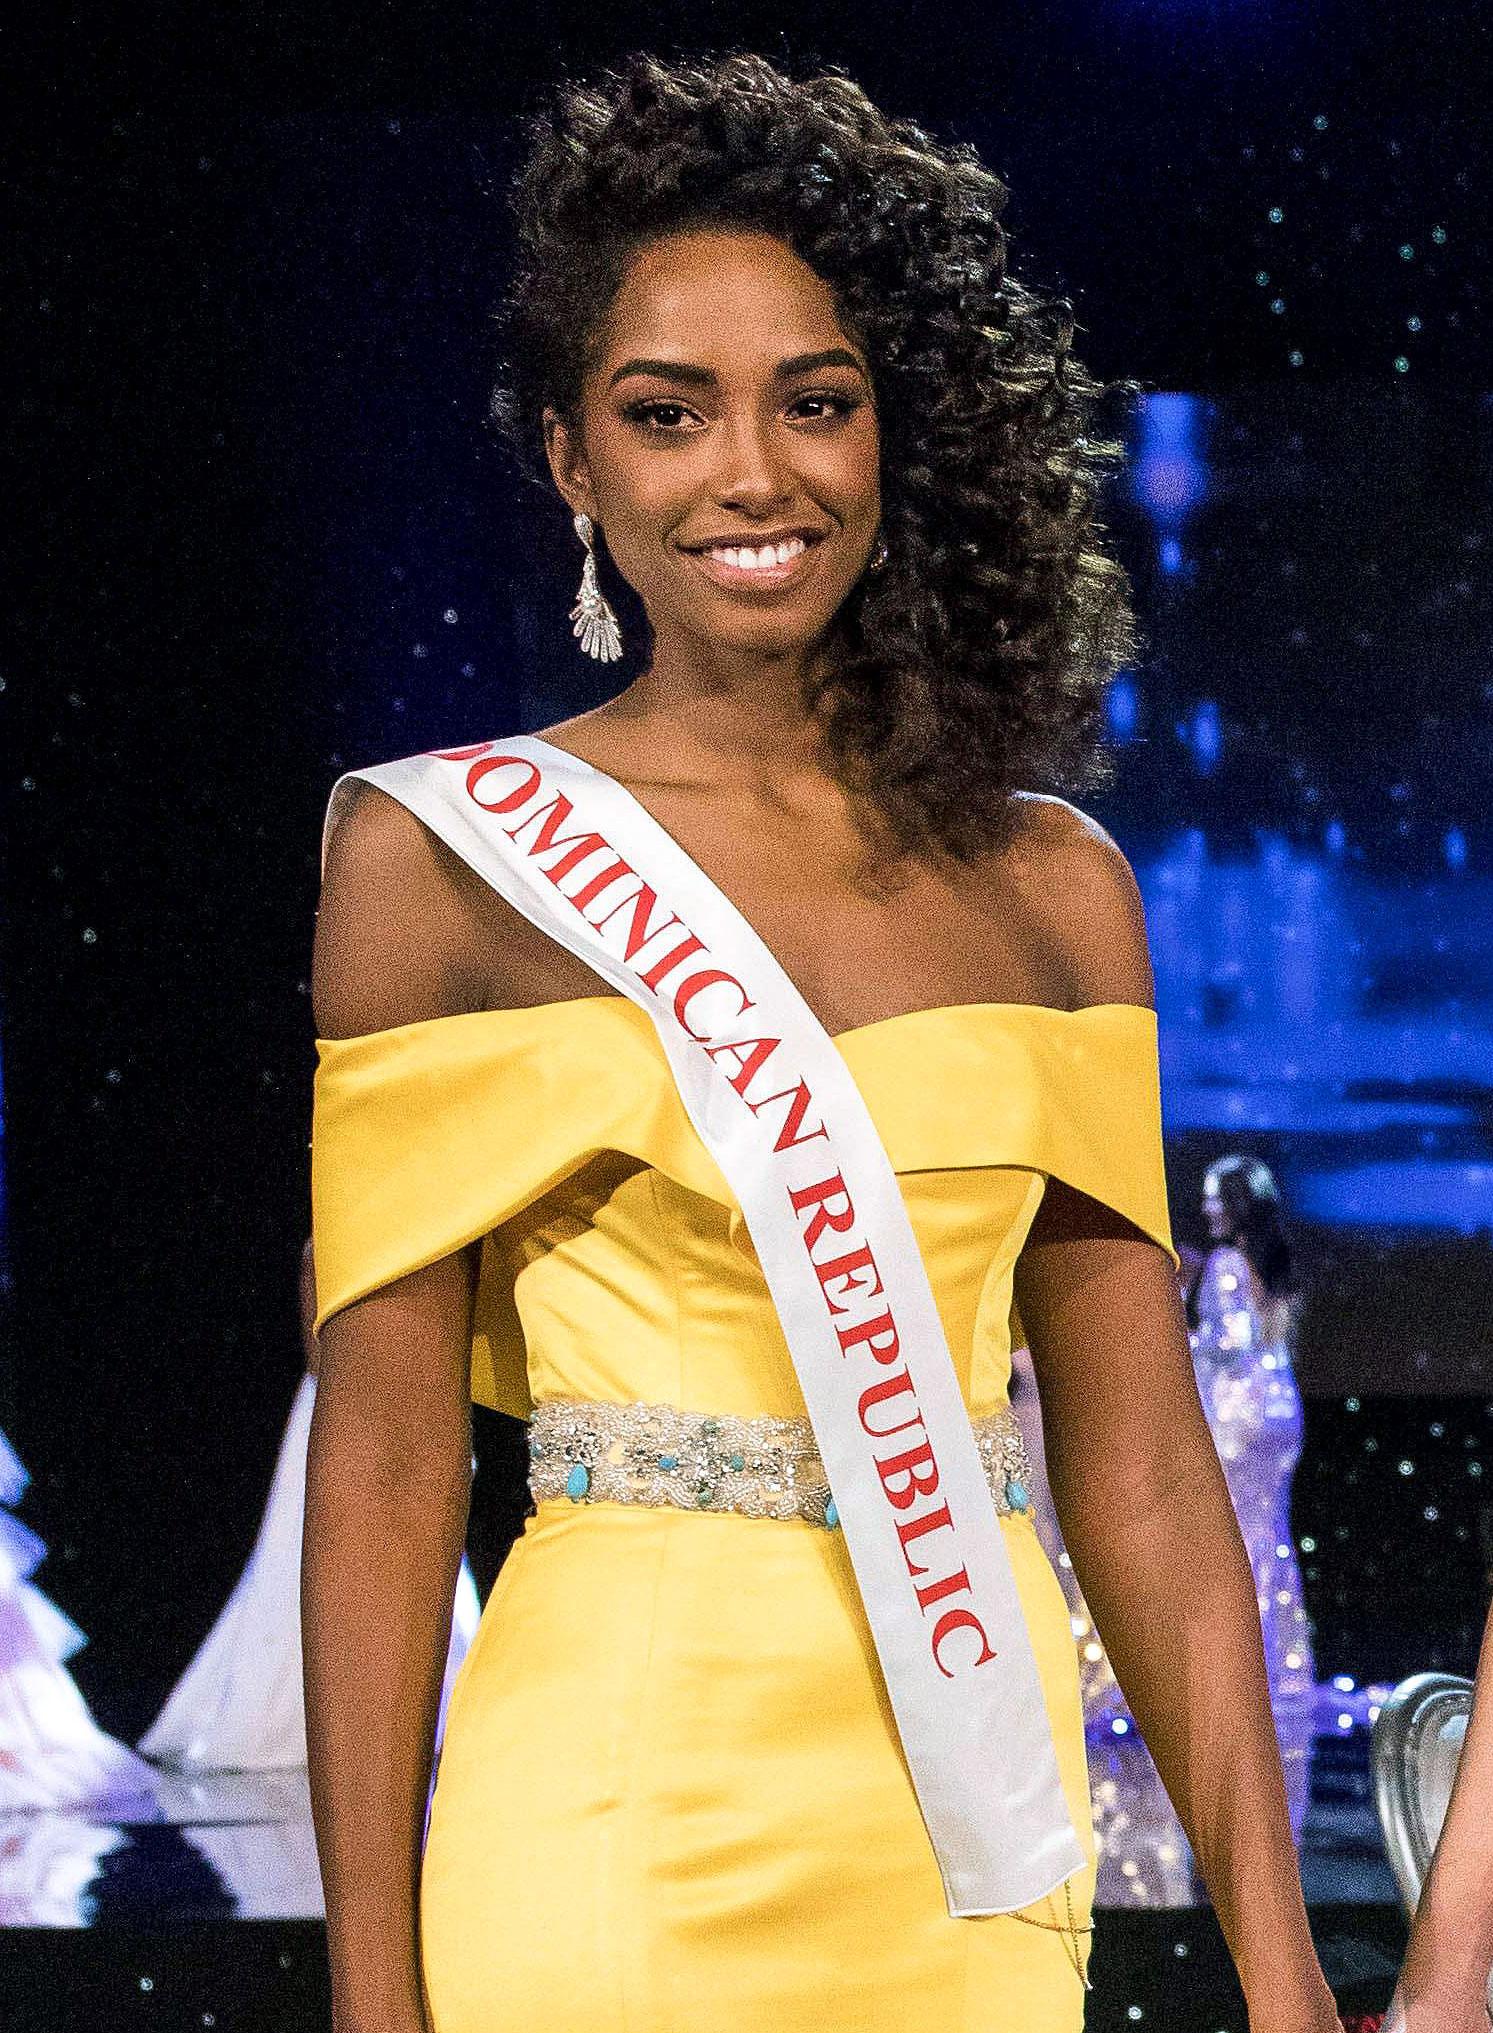 Yaritza Reyes